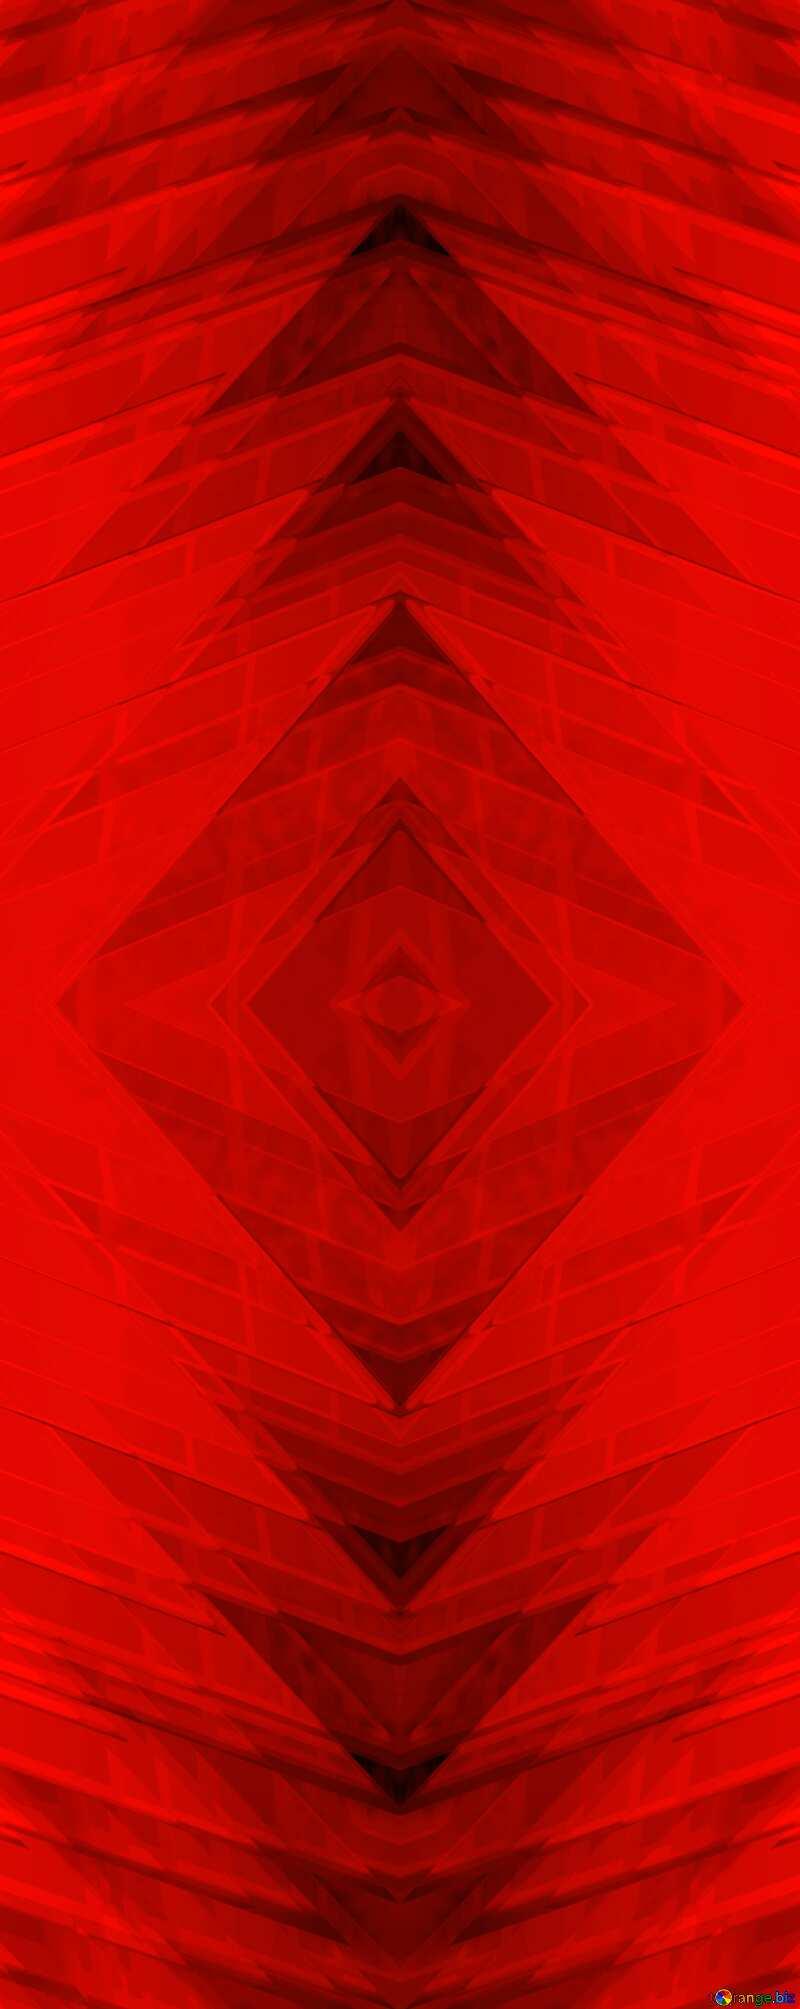 Red futuristic shape.  3D rendering geometric technology illustration.  Geometric Pattern №51526